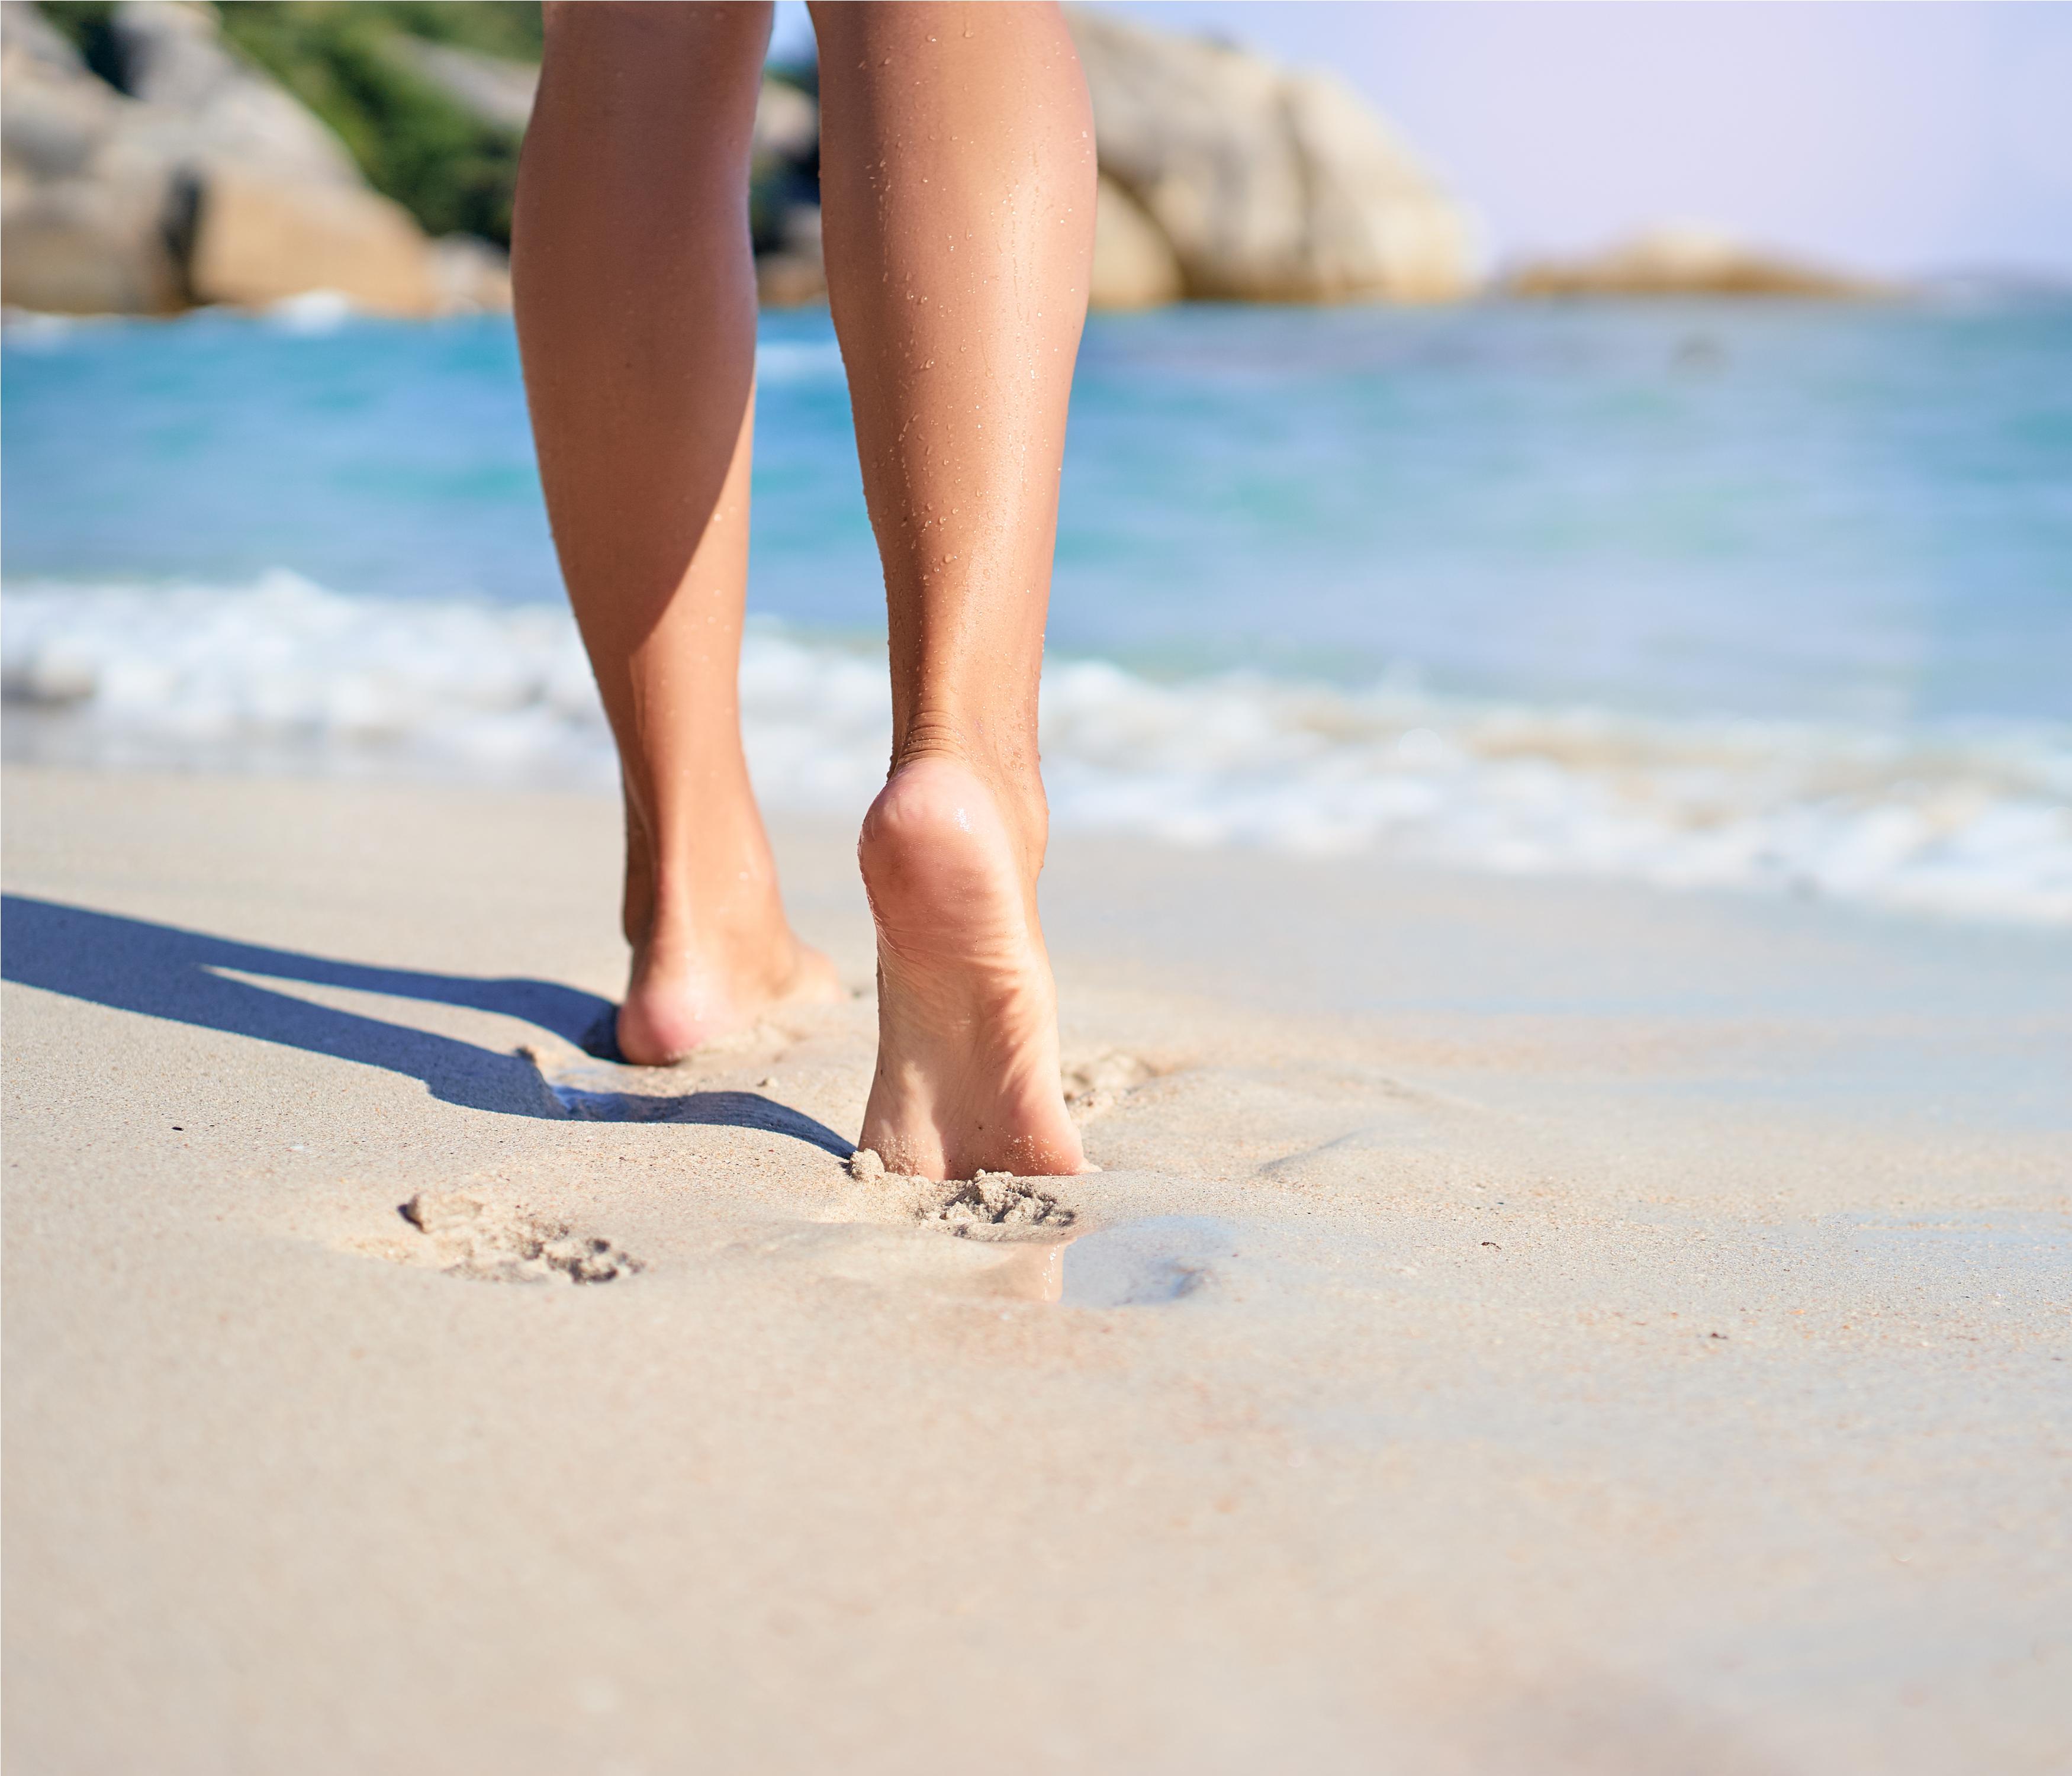 pies arena playa